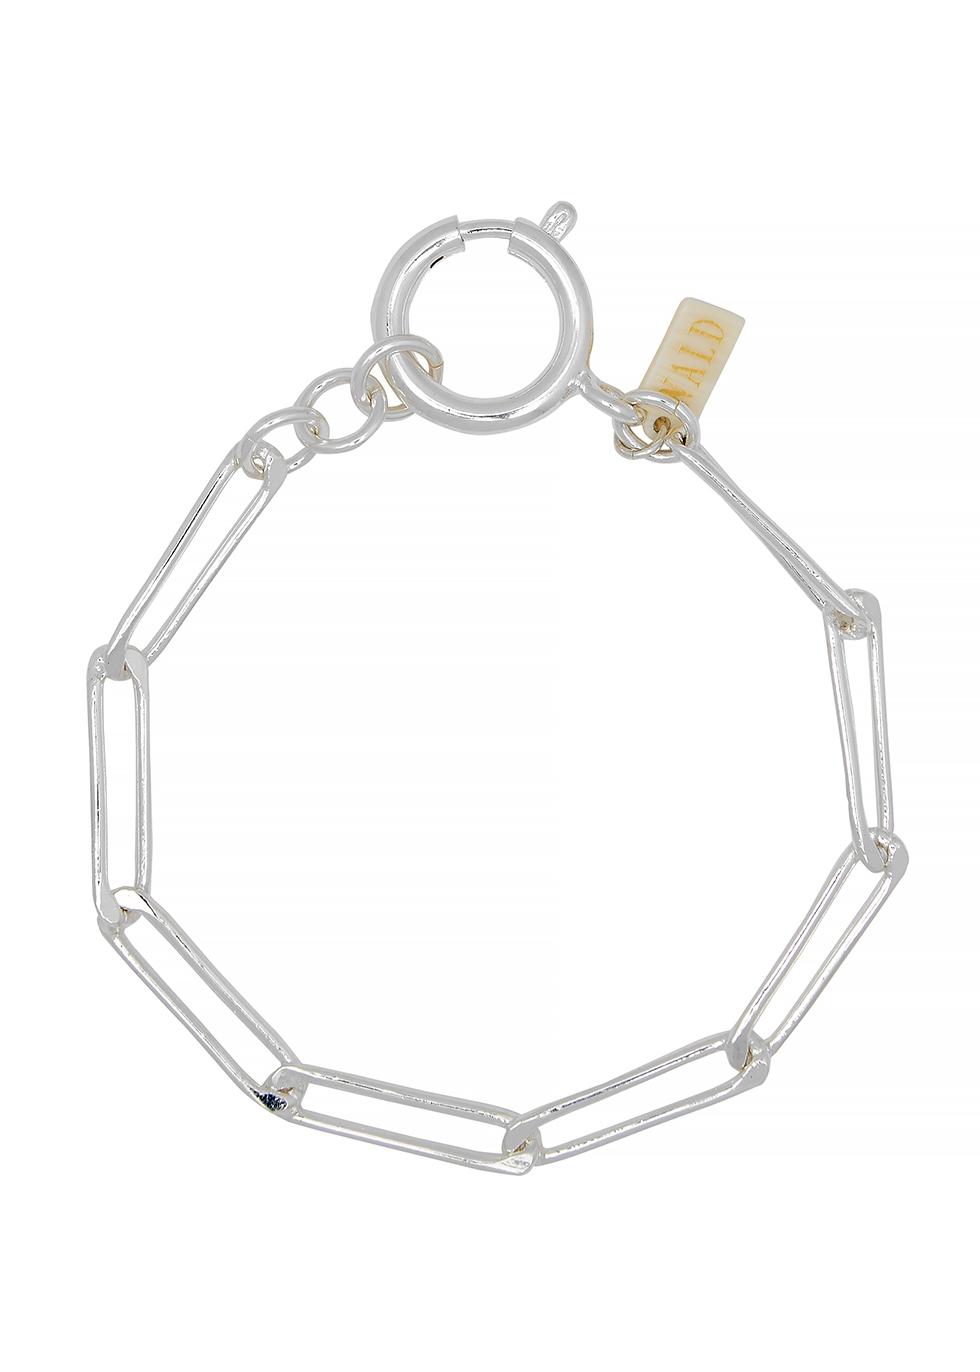 Ashley silver-plated chain bracelet